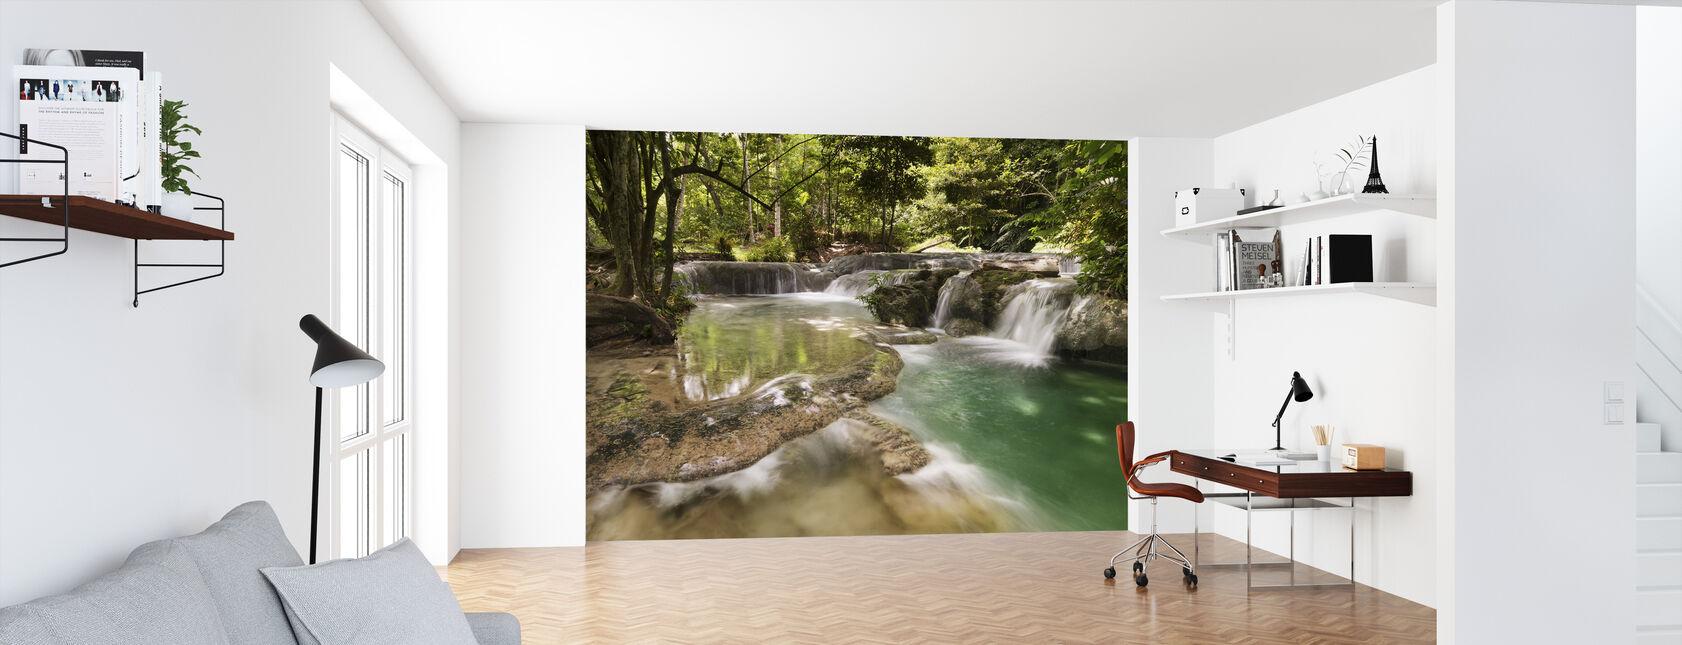 Panas Waterfalls II - Wallpaper - Office